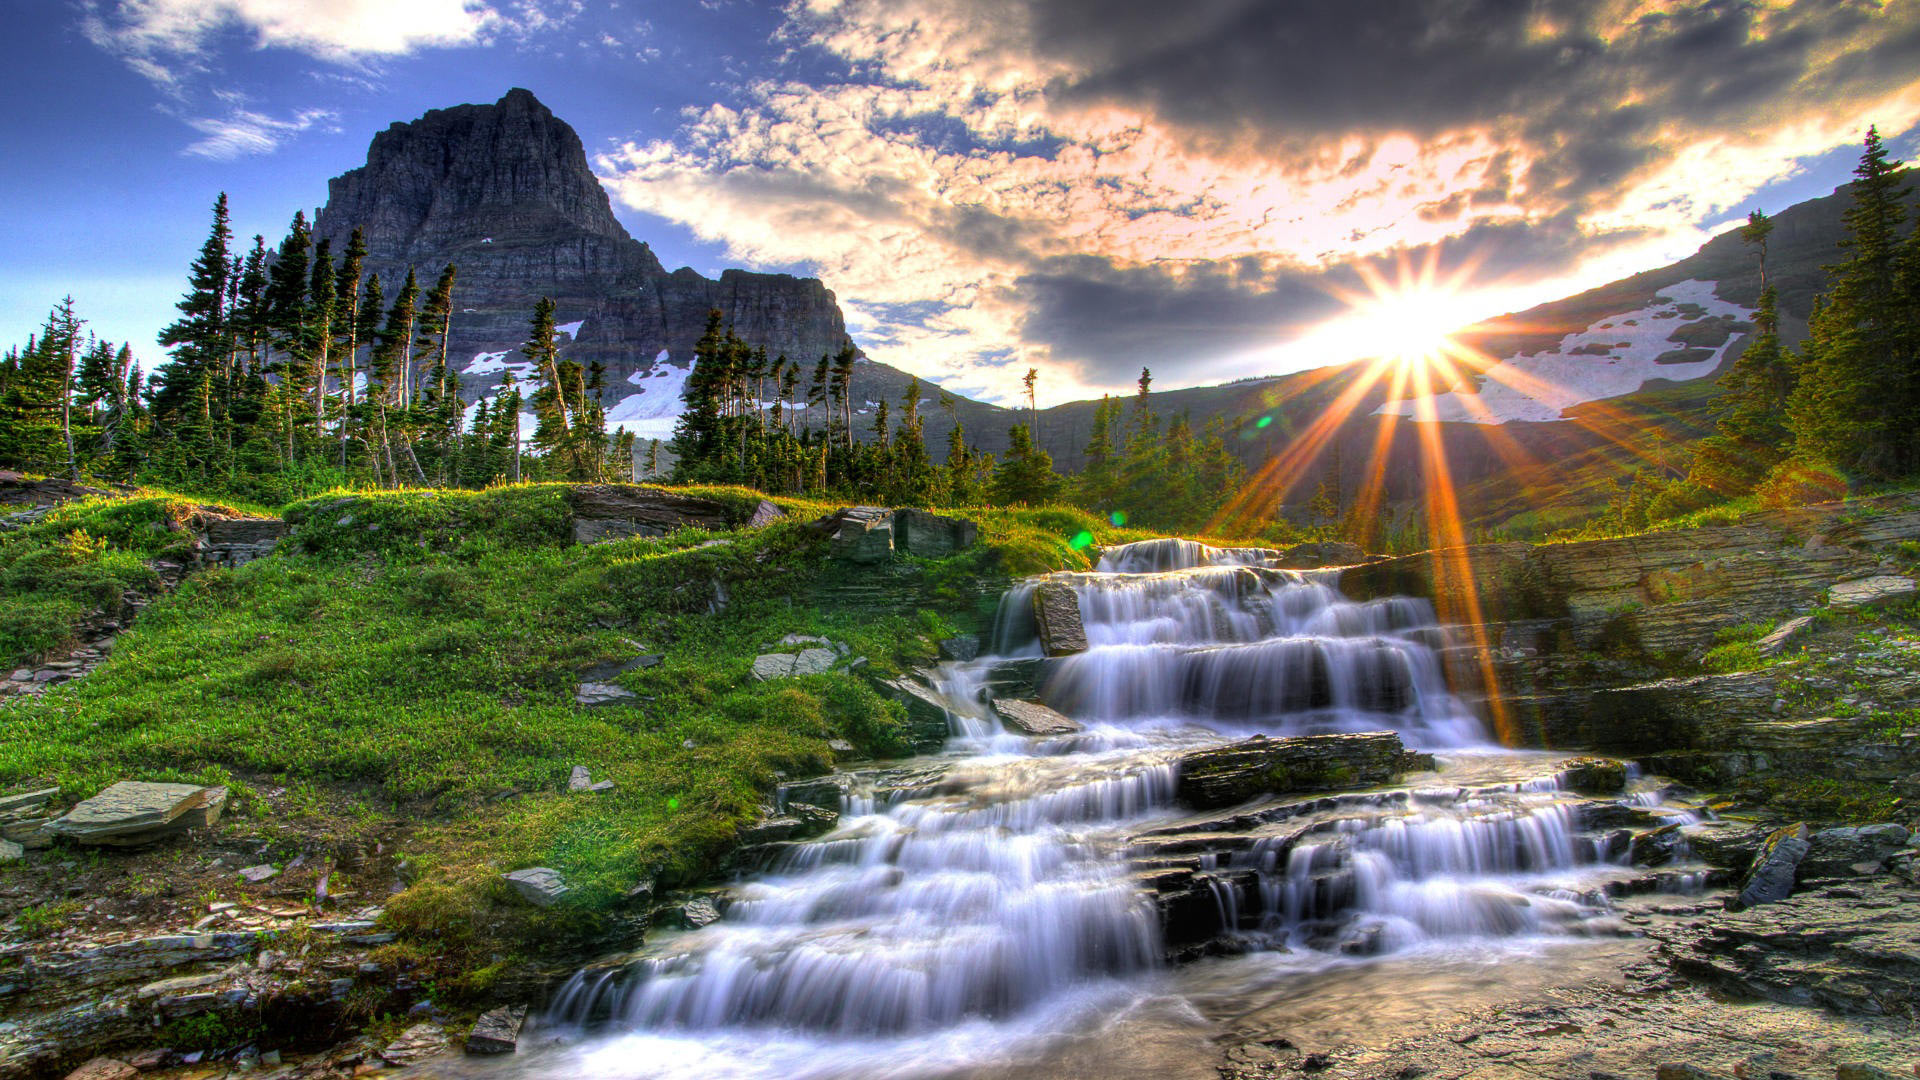 waterfall hd backgrounds for desktop